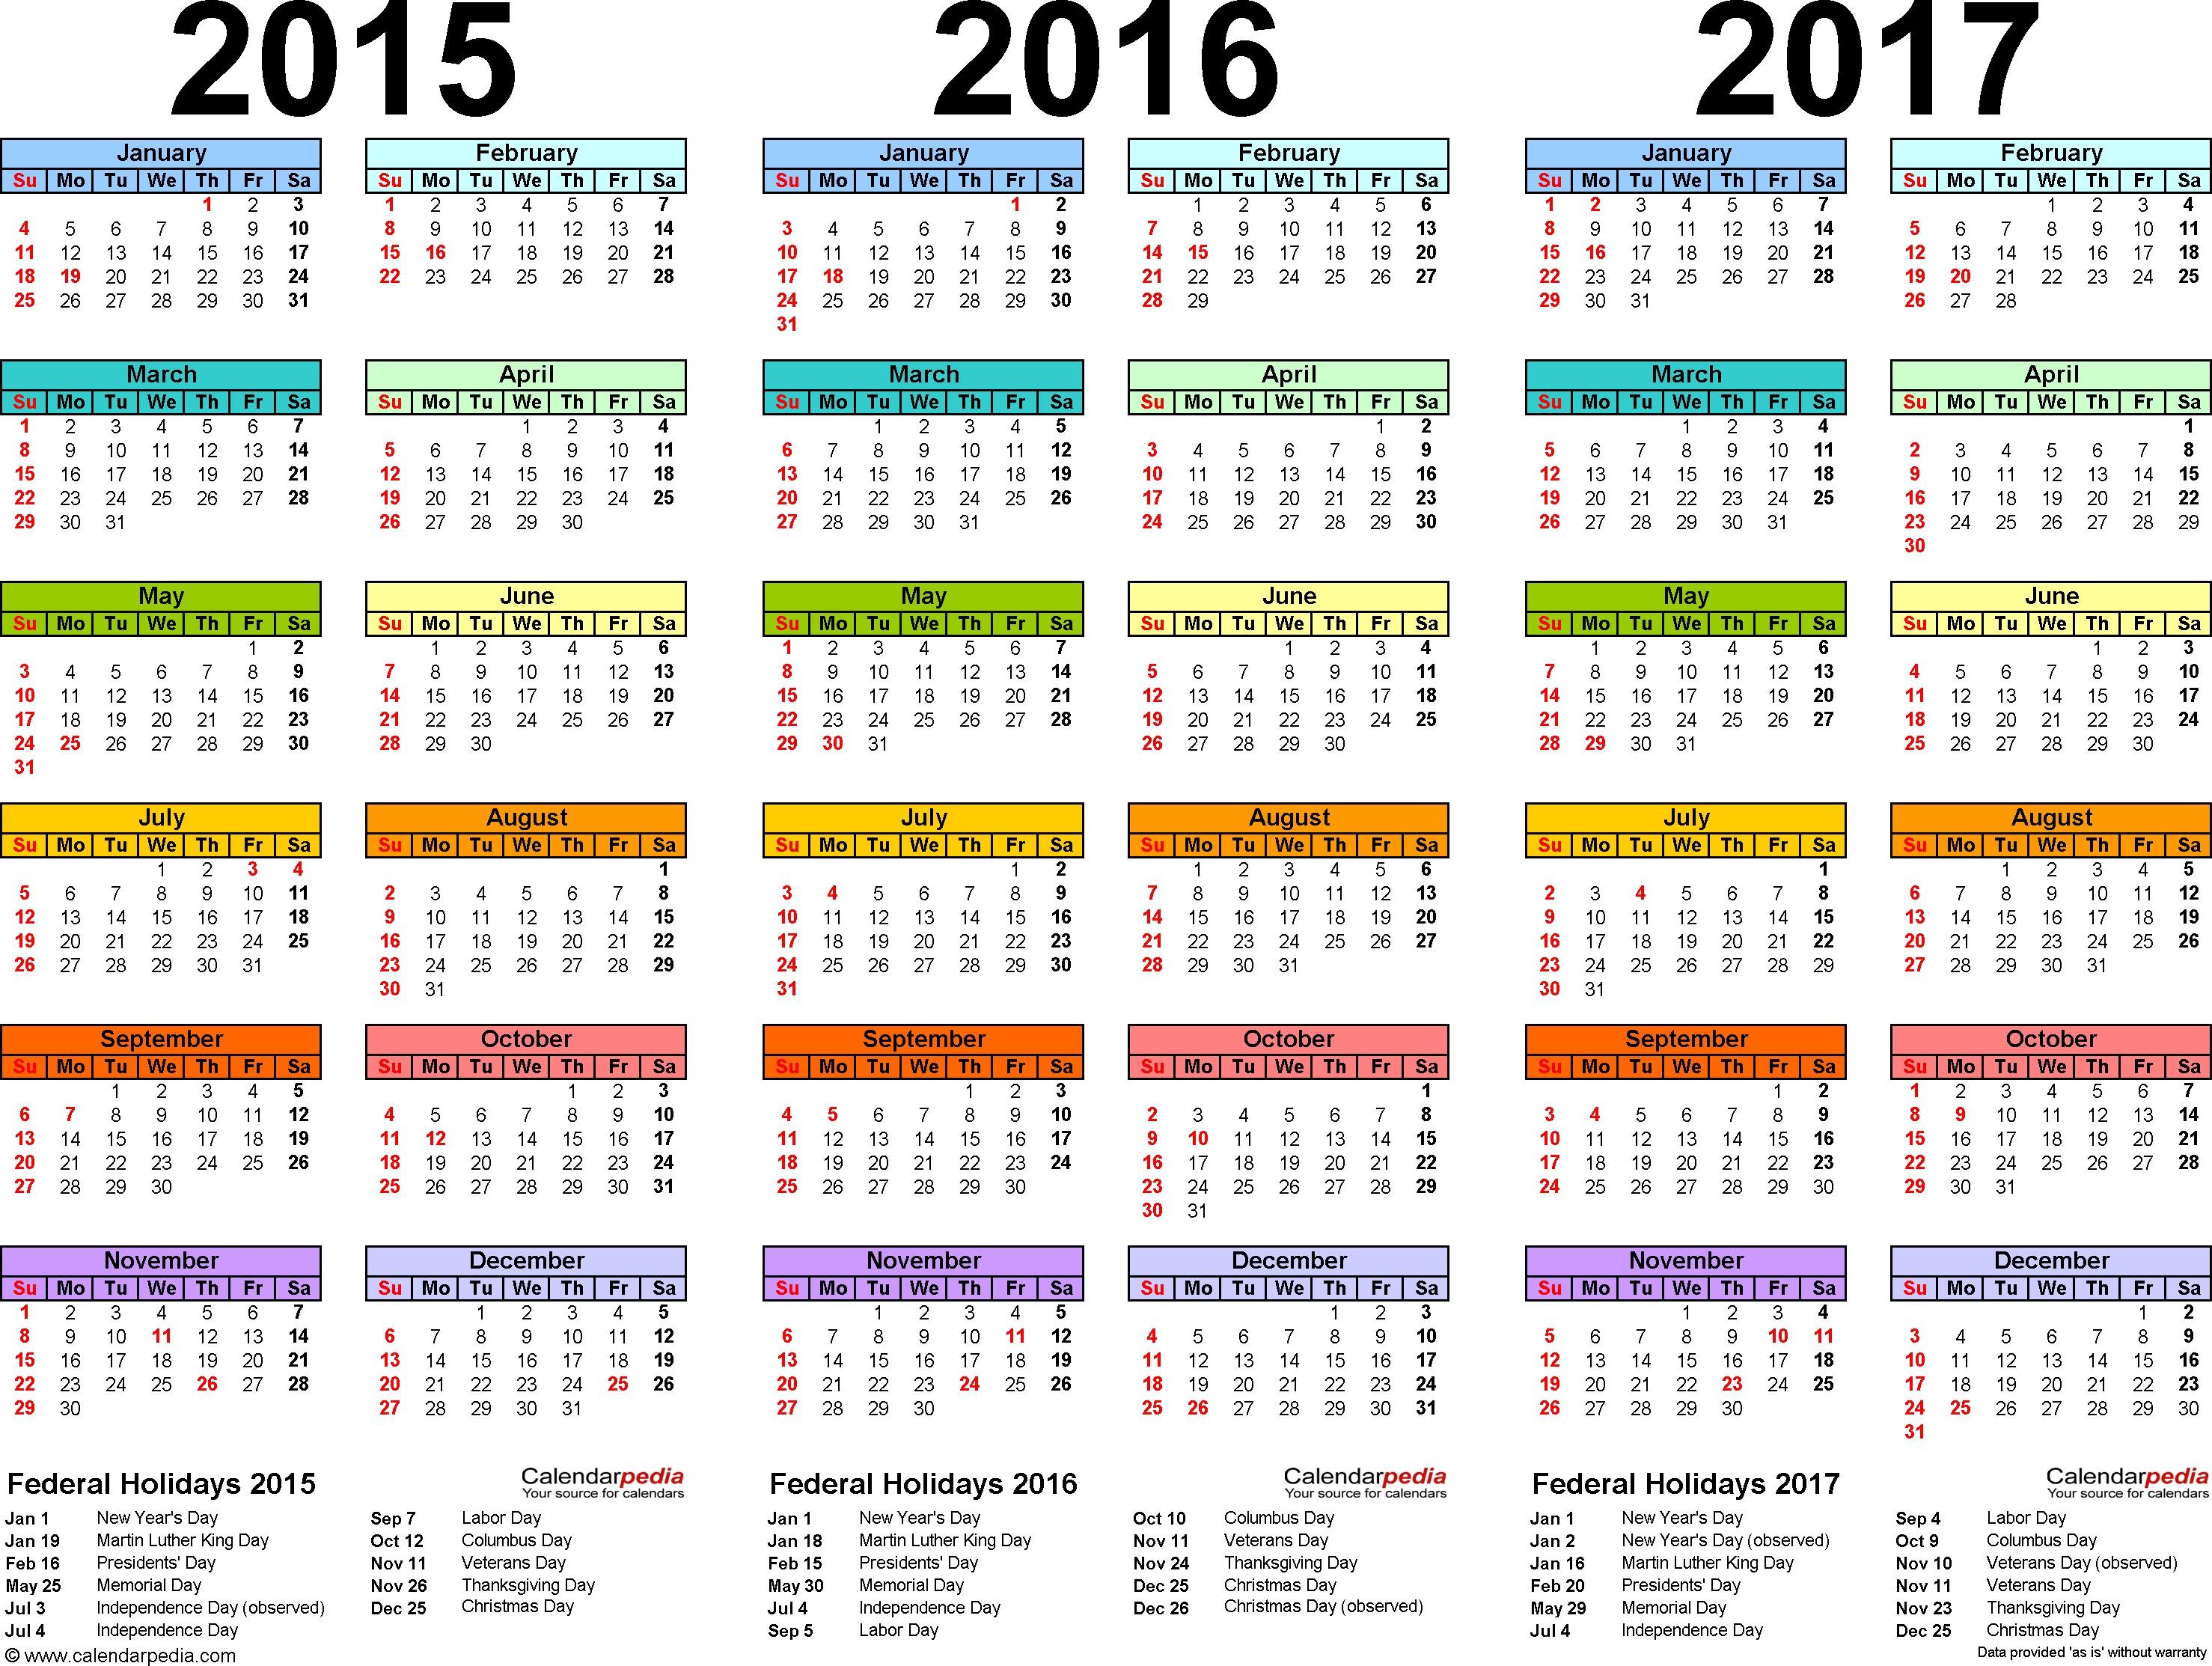 2019 Year Calendar In Excel Más Populares 2015 2016 2017 Calendar 4 Three Year Printable Pdf Calendars Of 2019 Year Calendar In Excel Más Recientes Julian Date Calendar 2019 2018 Julian Calendar Pdf Printable